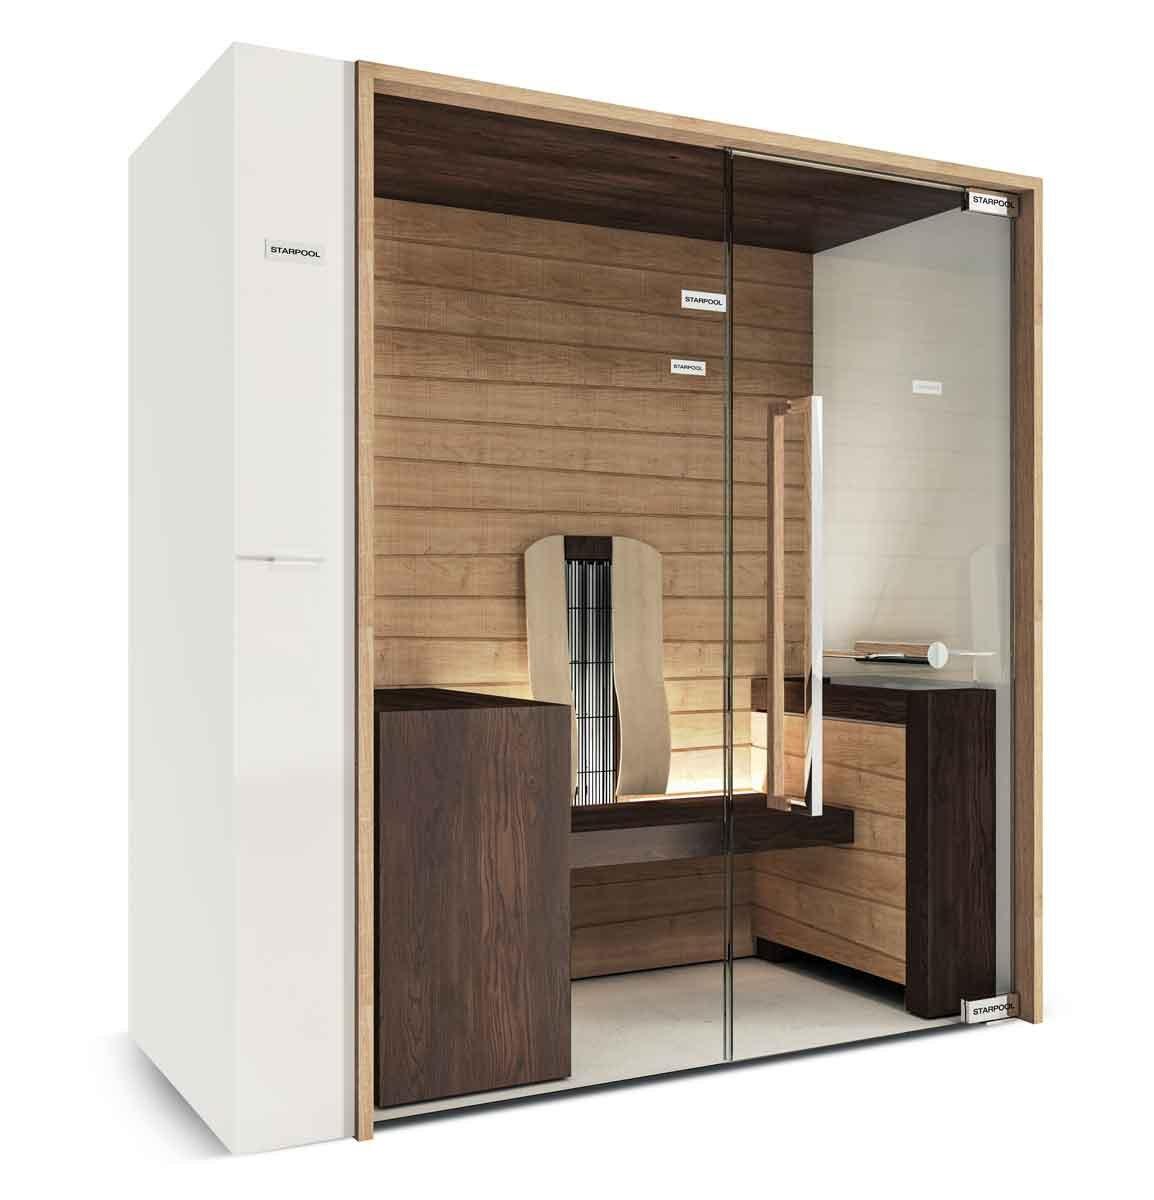 La sauna anche a casa cose di casa for Piani di sauna a casa